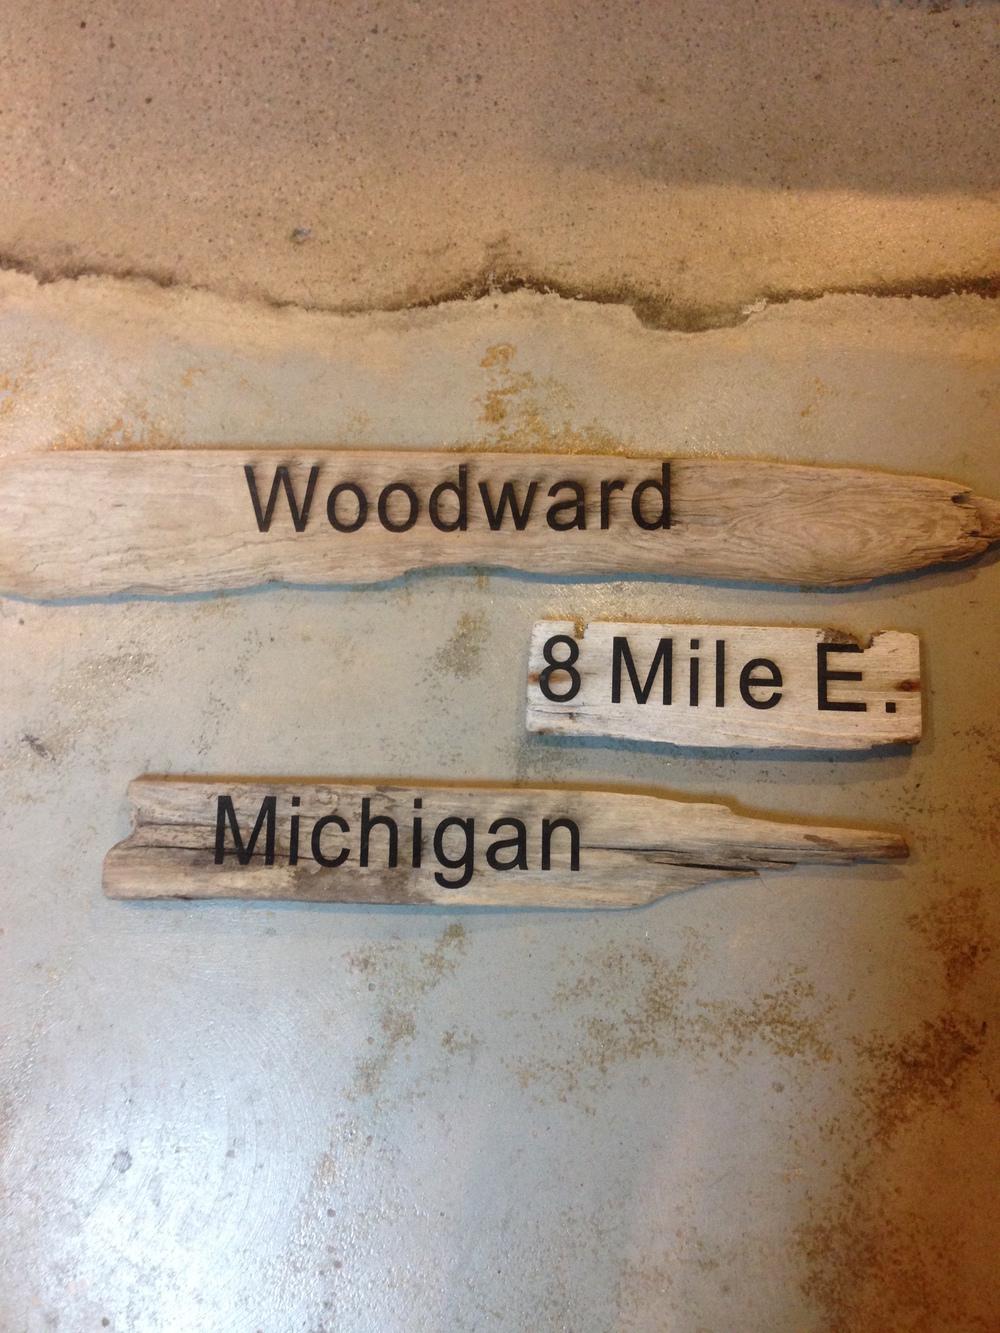 MI_driftwood_store.JPG